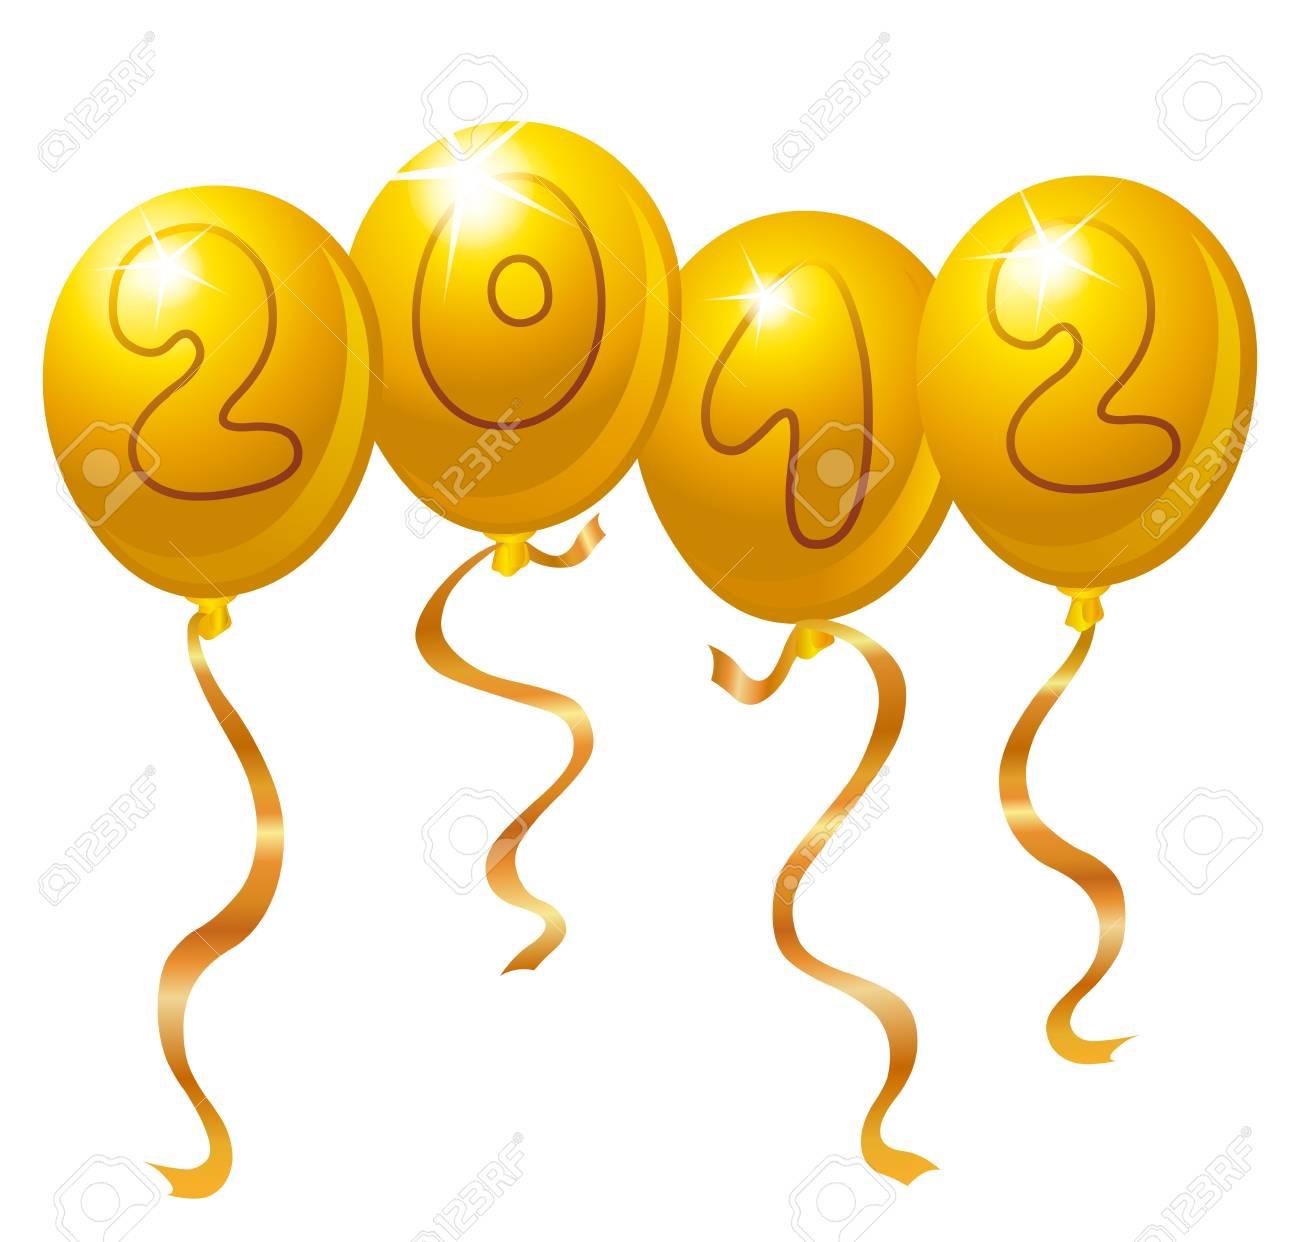 2012 New Year balloons Stock Vector - 11376107